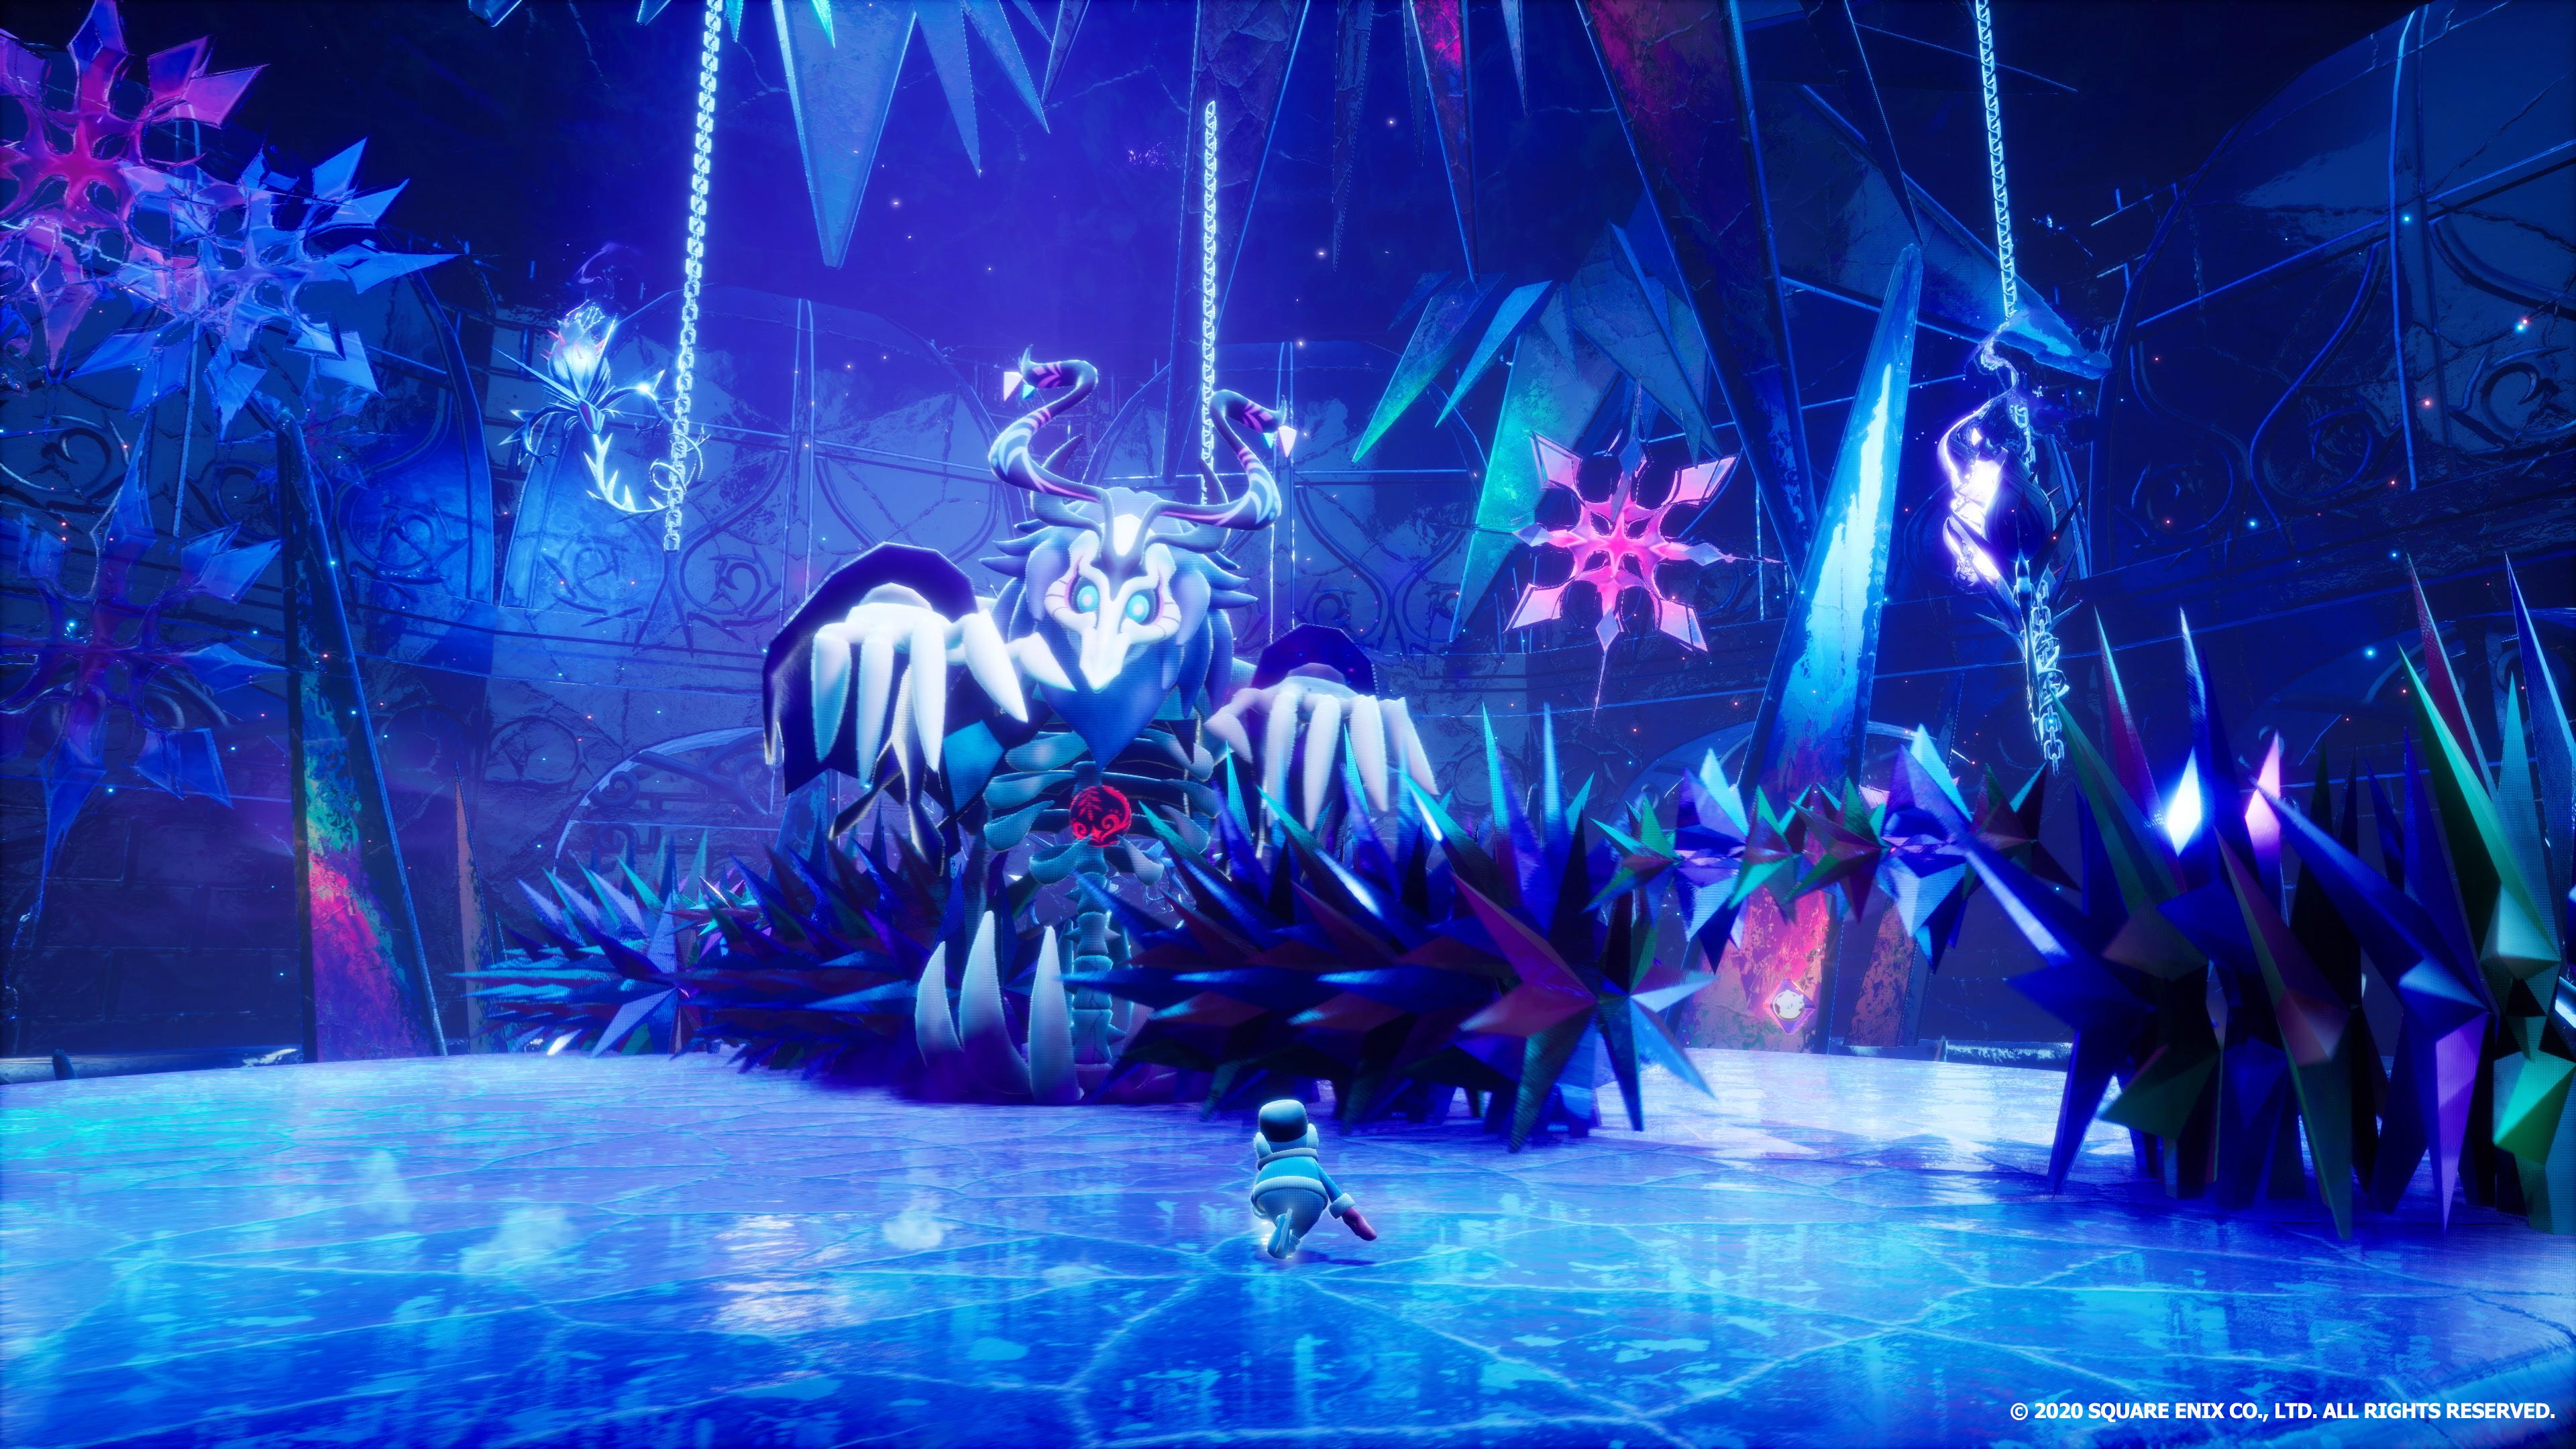 Square Enix анонсировала платформер Balan Wonderworld от создателей Sonic the Hedgehog